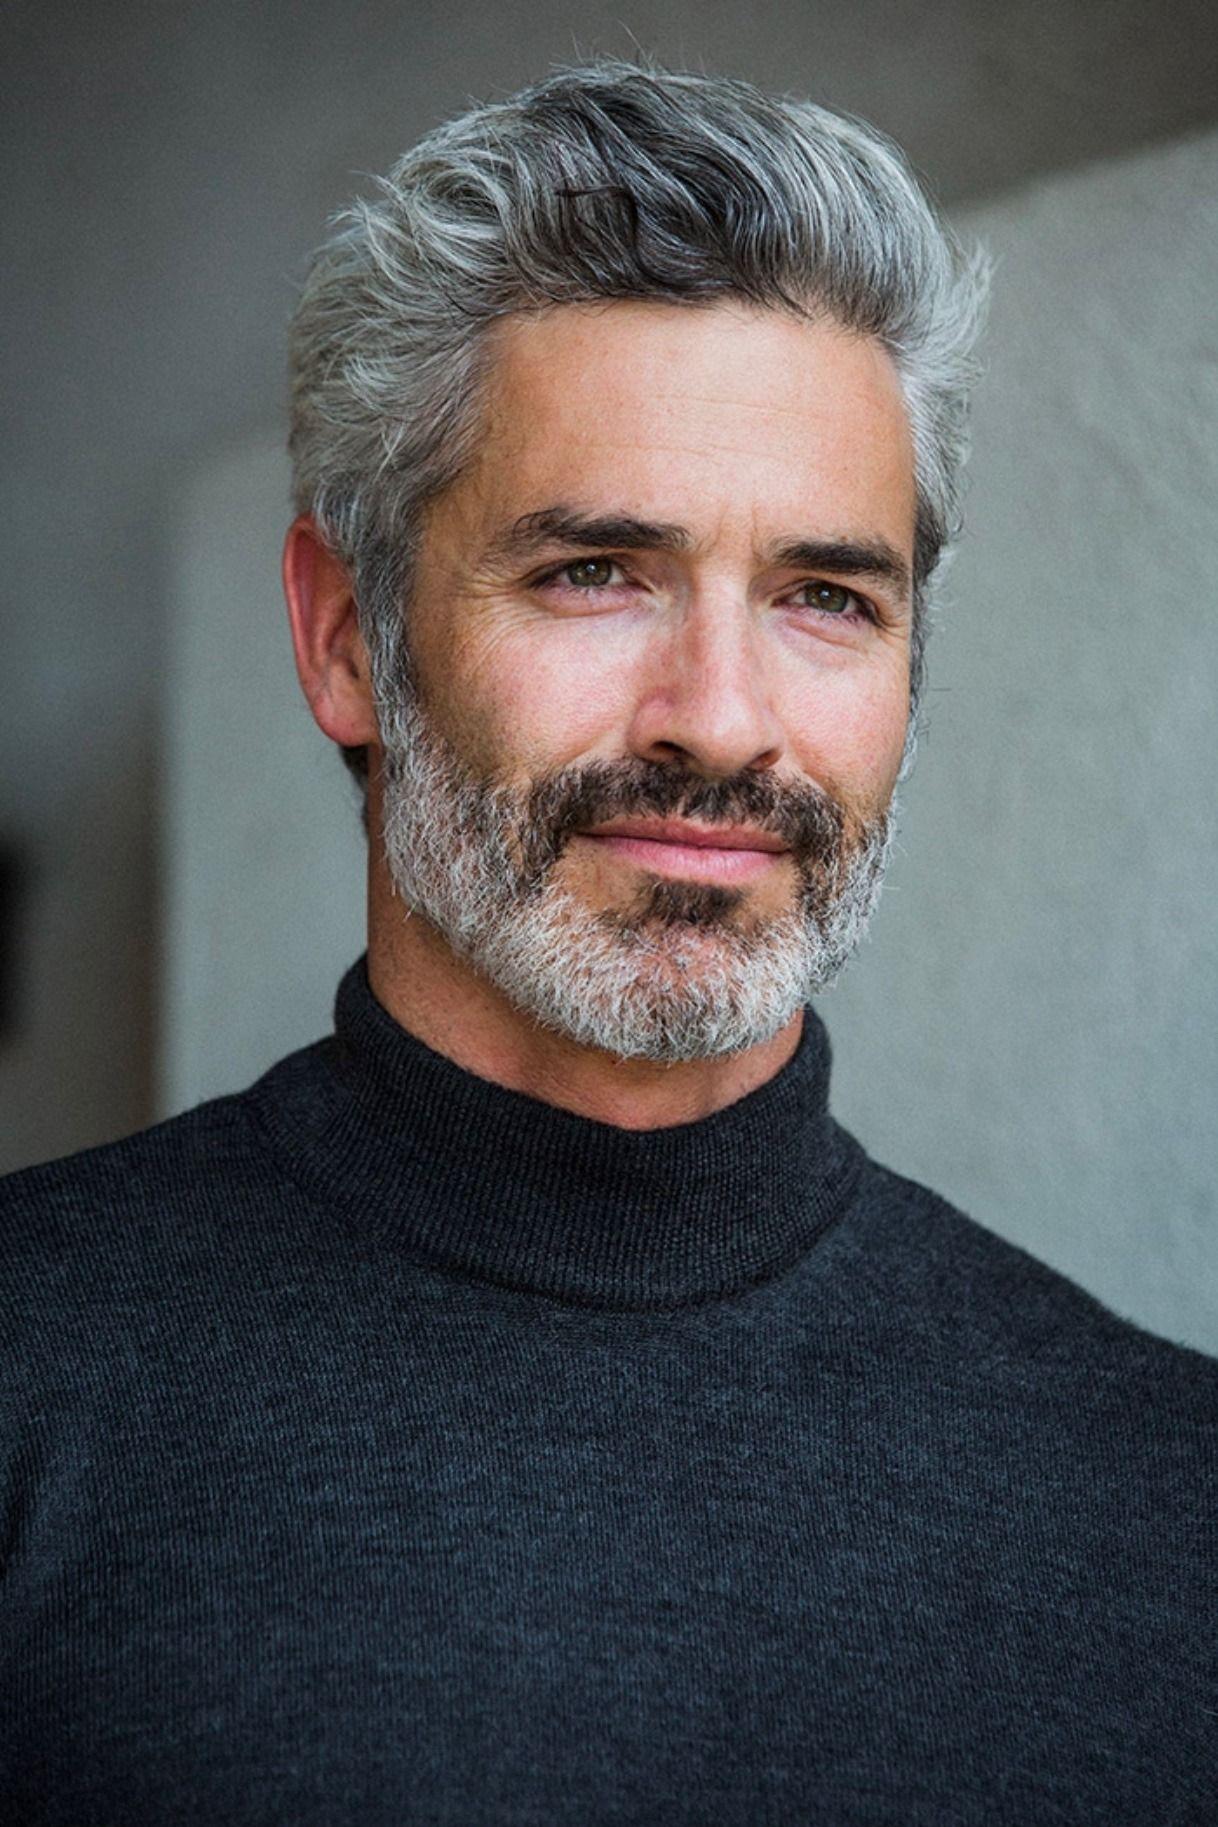 Jeremy Pflaum Model Grey Hair Men Older Mens Hairstyles Grey Beards